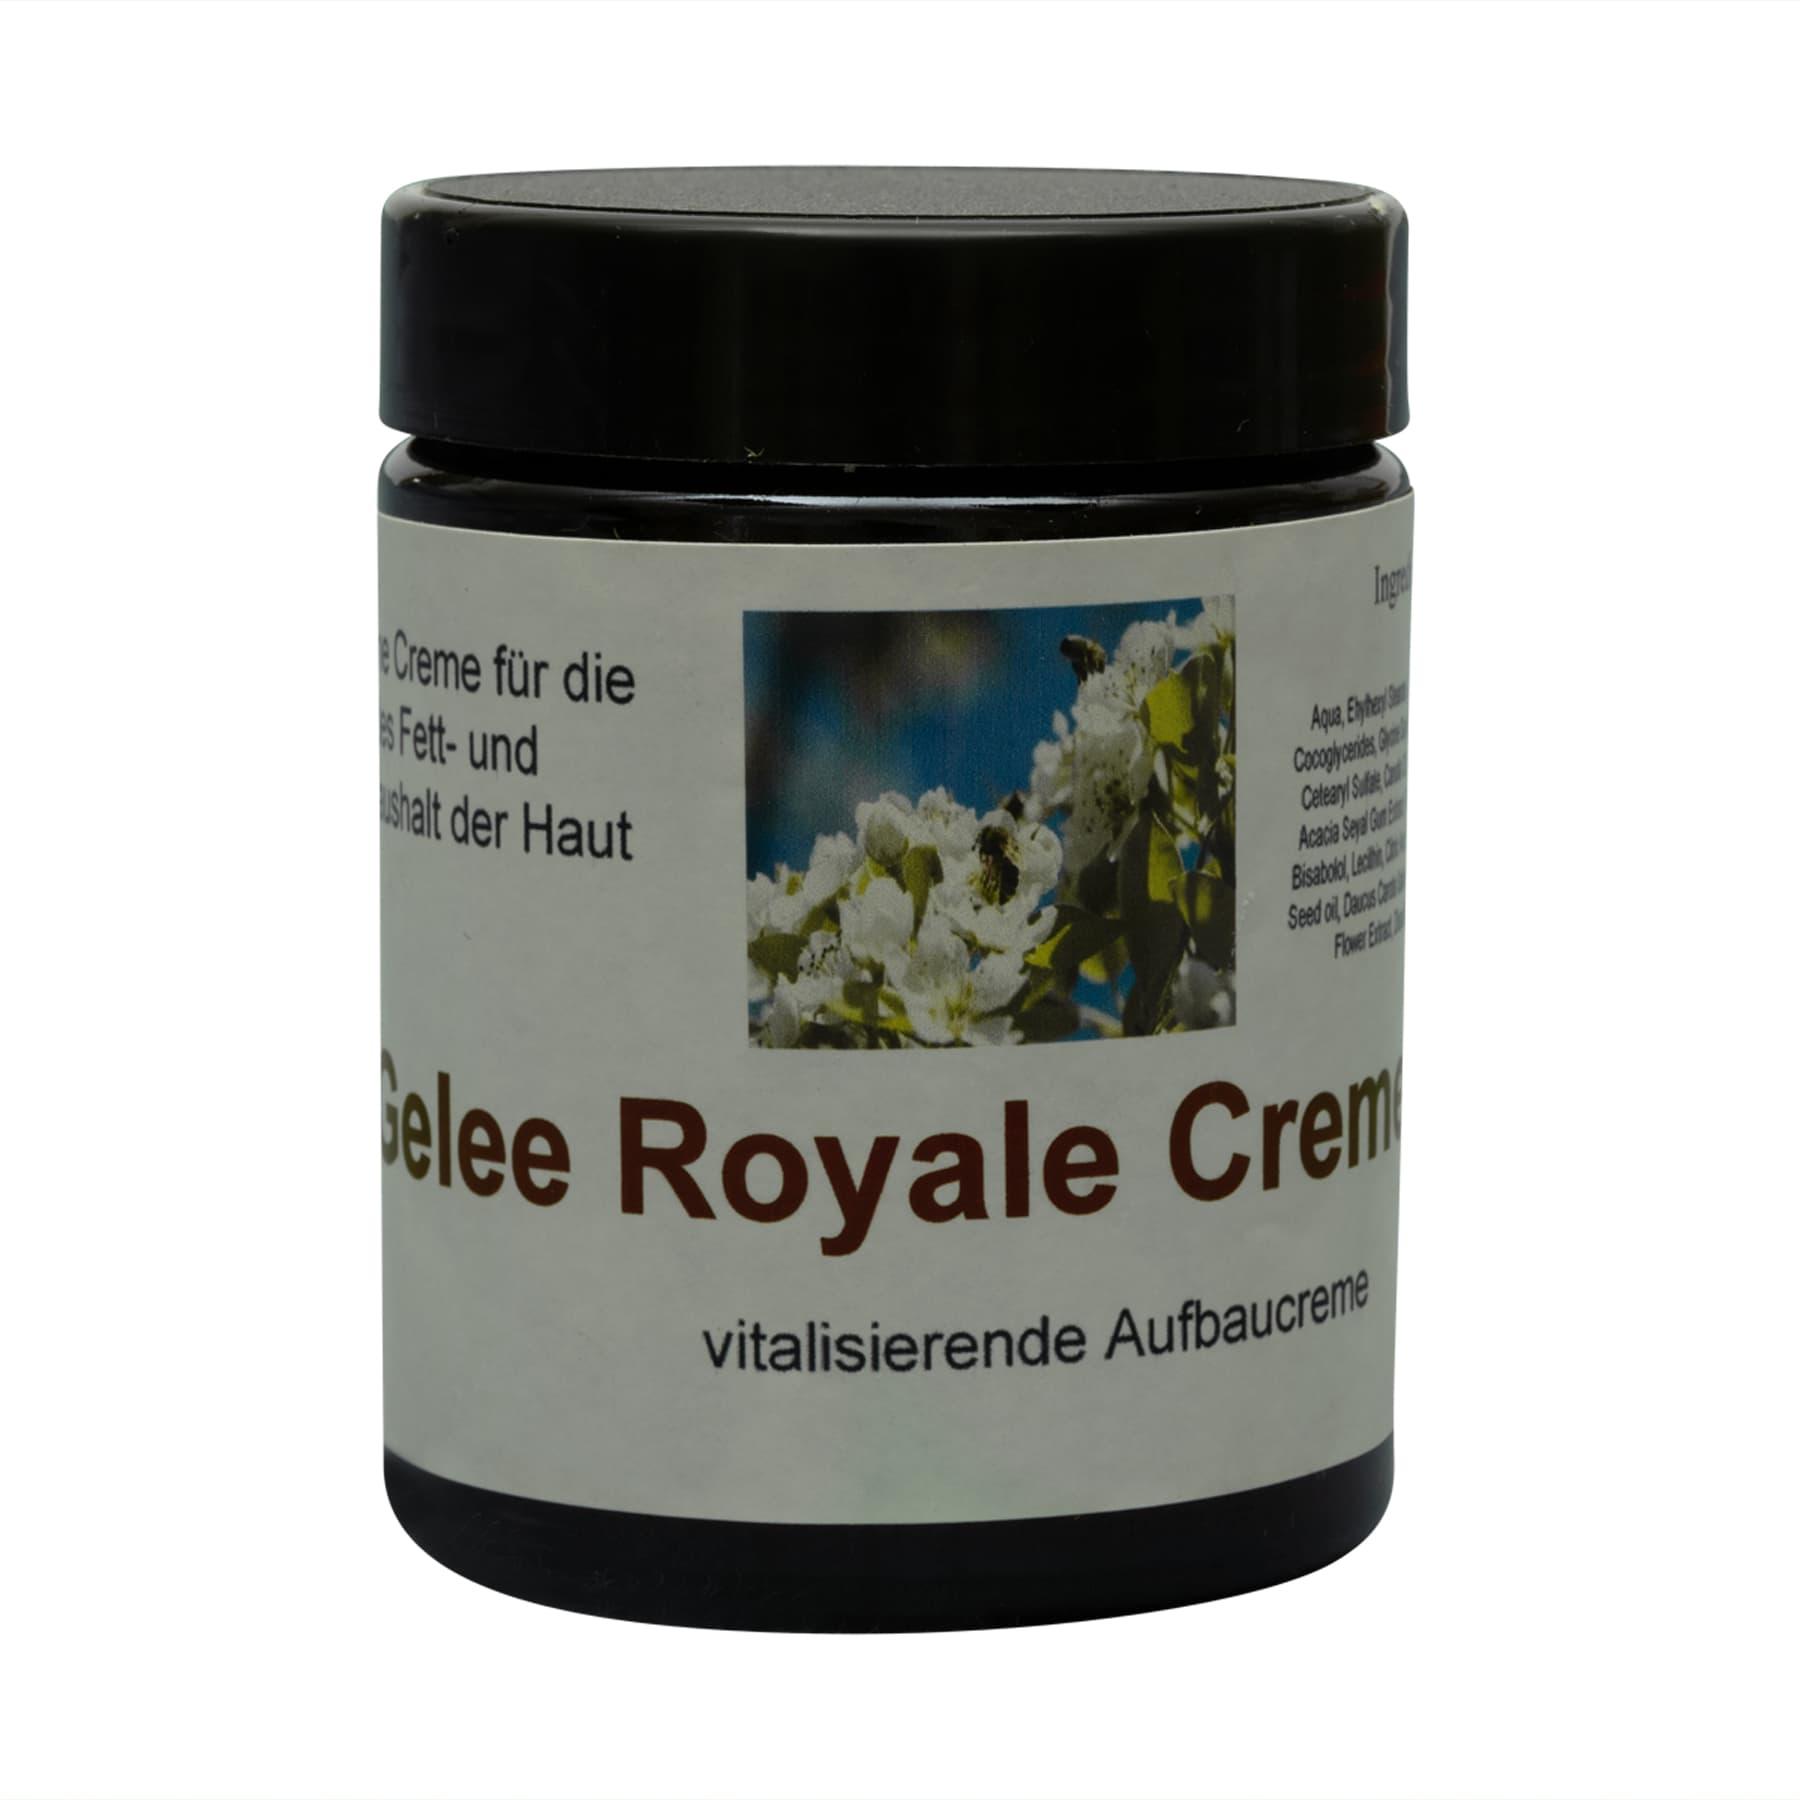 Hautcreme mit Gelee Royal 100 ml